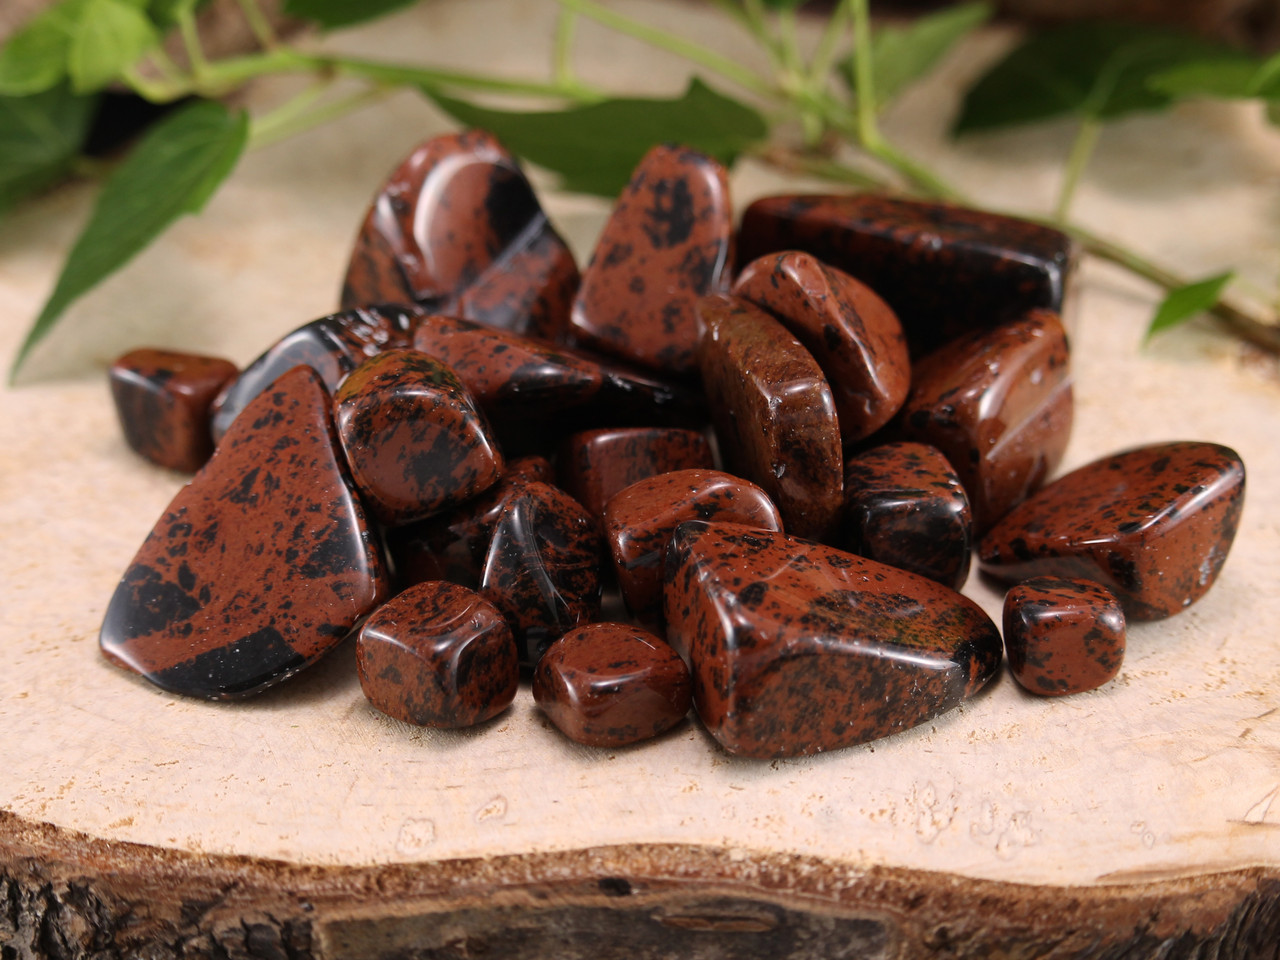 Polished Obsidians Mahogany Obsidian Tumbled Stones Nice Quality